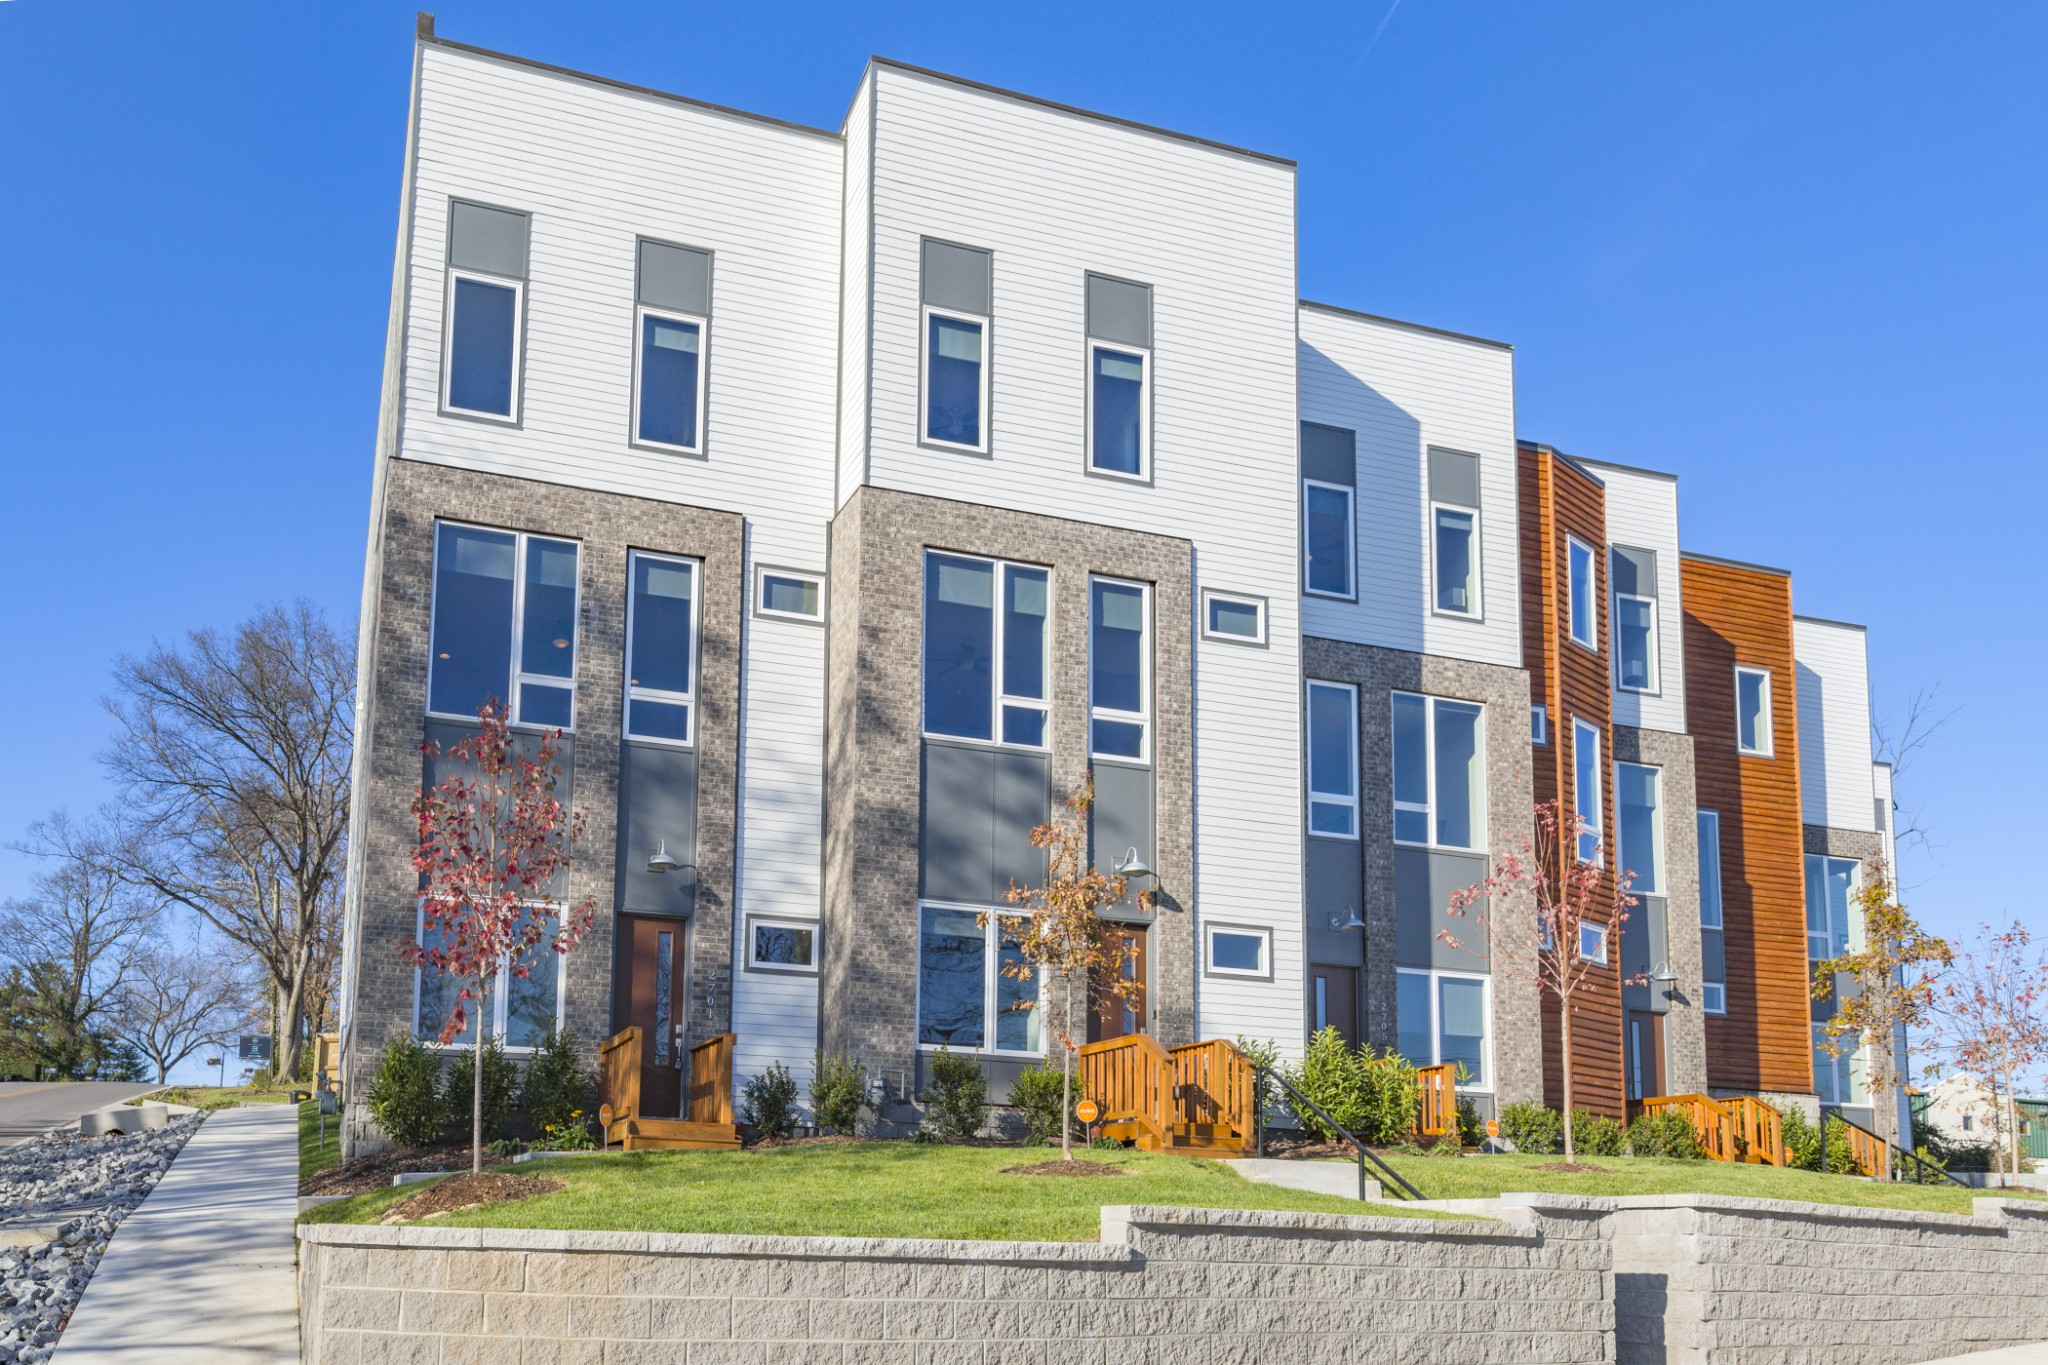 2701 Biloxi Ave Property Photo - Nashville, TN real estate listing